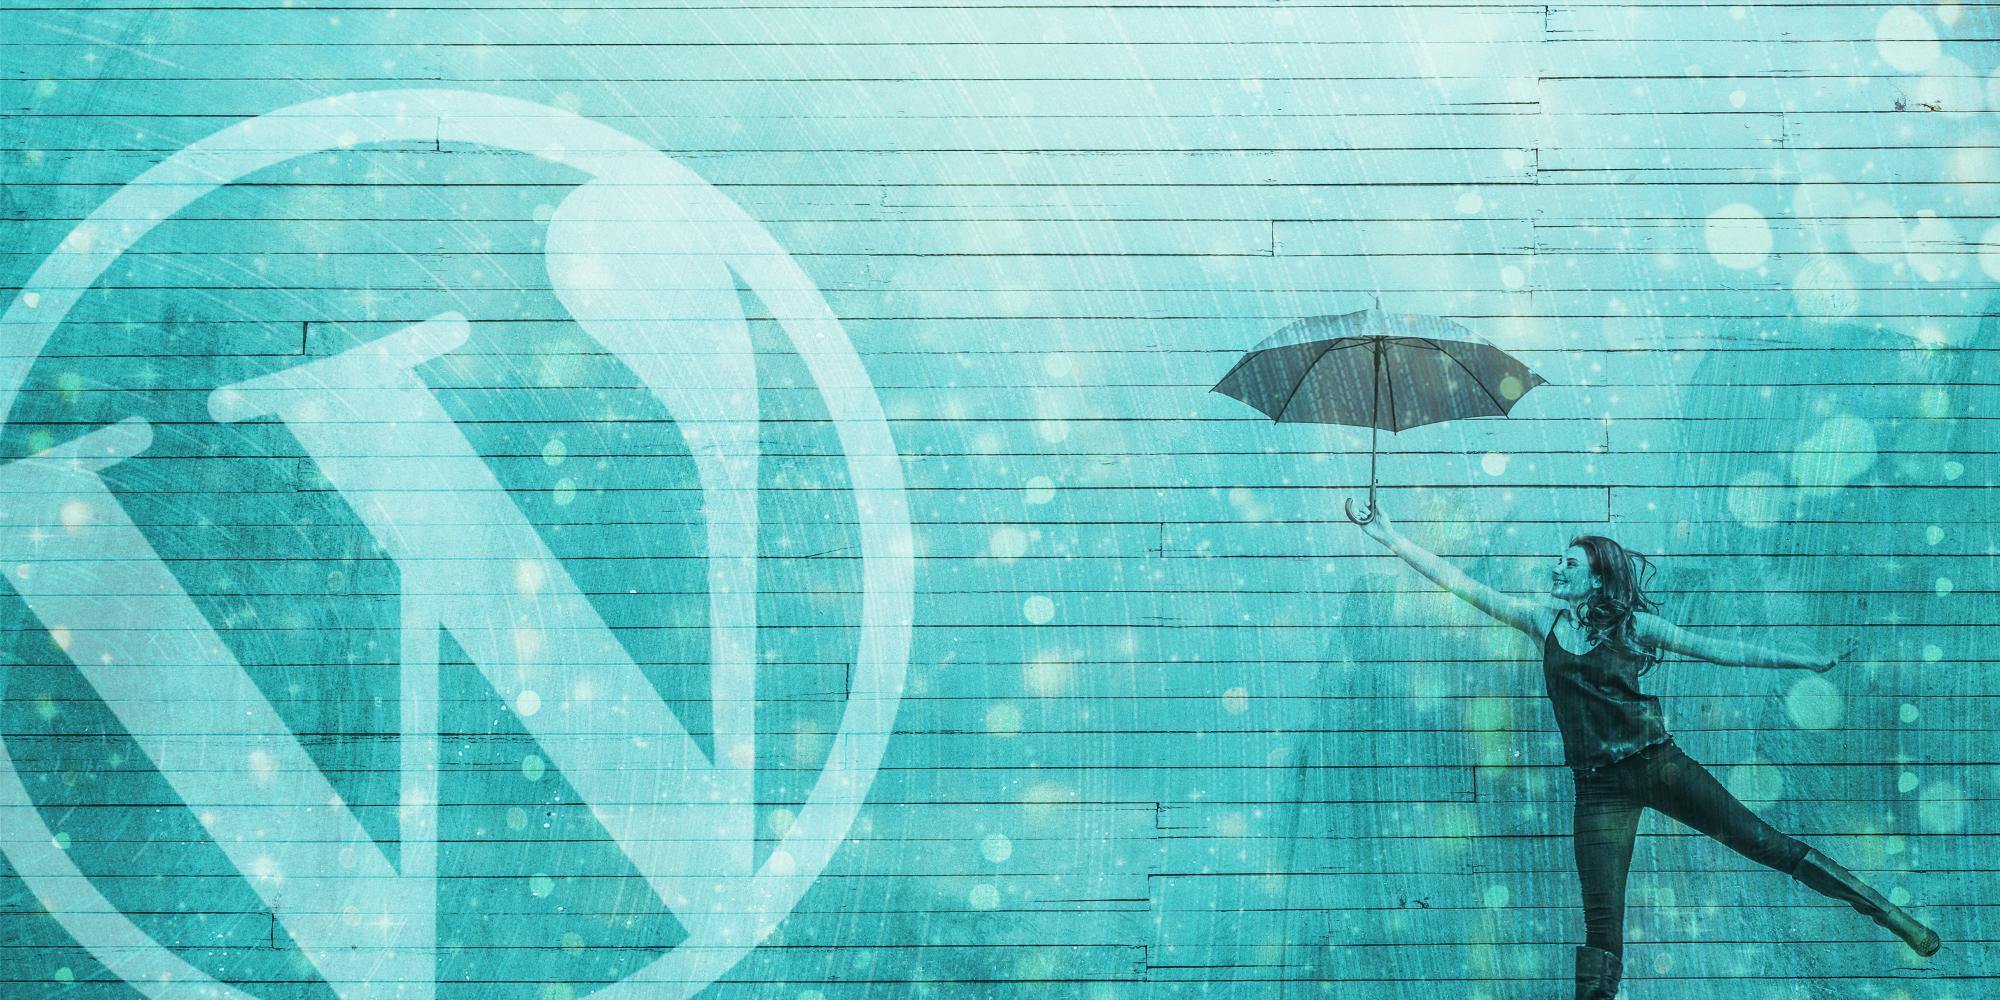 WordPress Theme Development Service by LaLa Projects